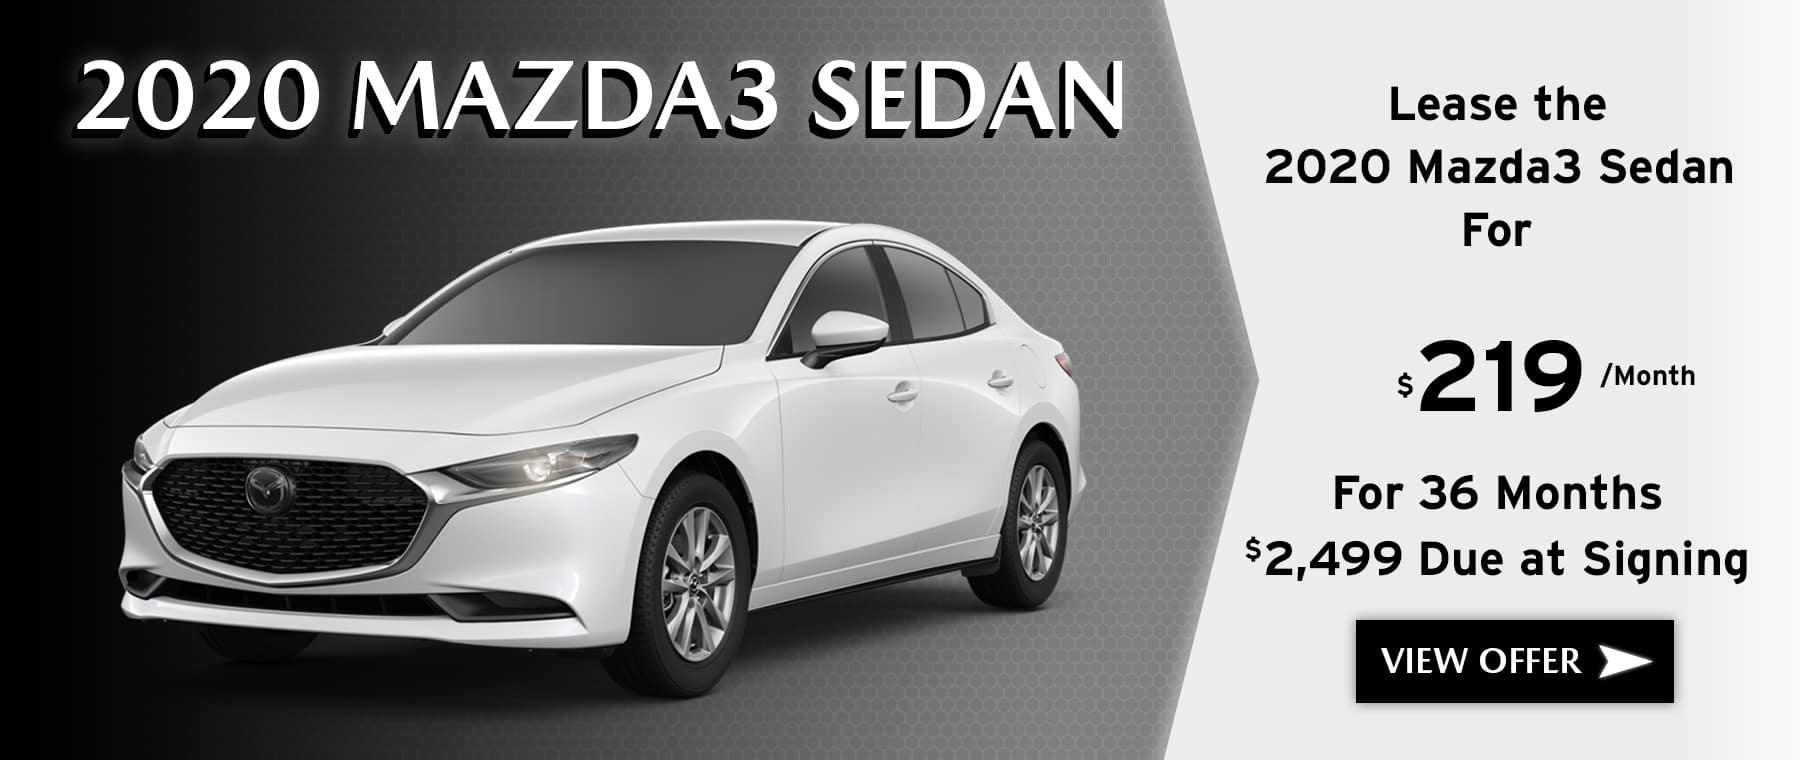 2020 Mazda3 Sedan Lease offer $219 A month for 36 Months at Kiefer Mazda